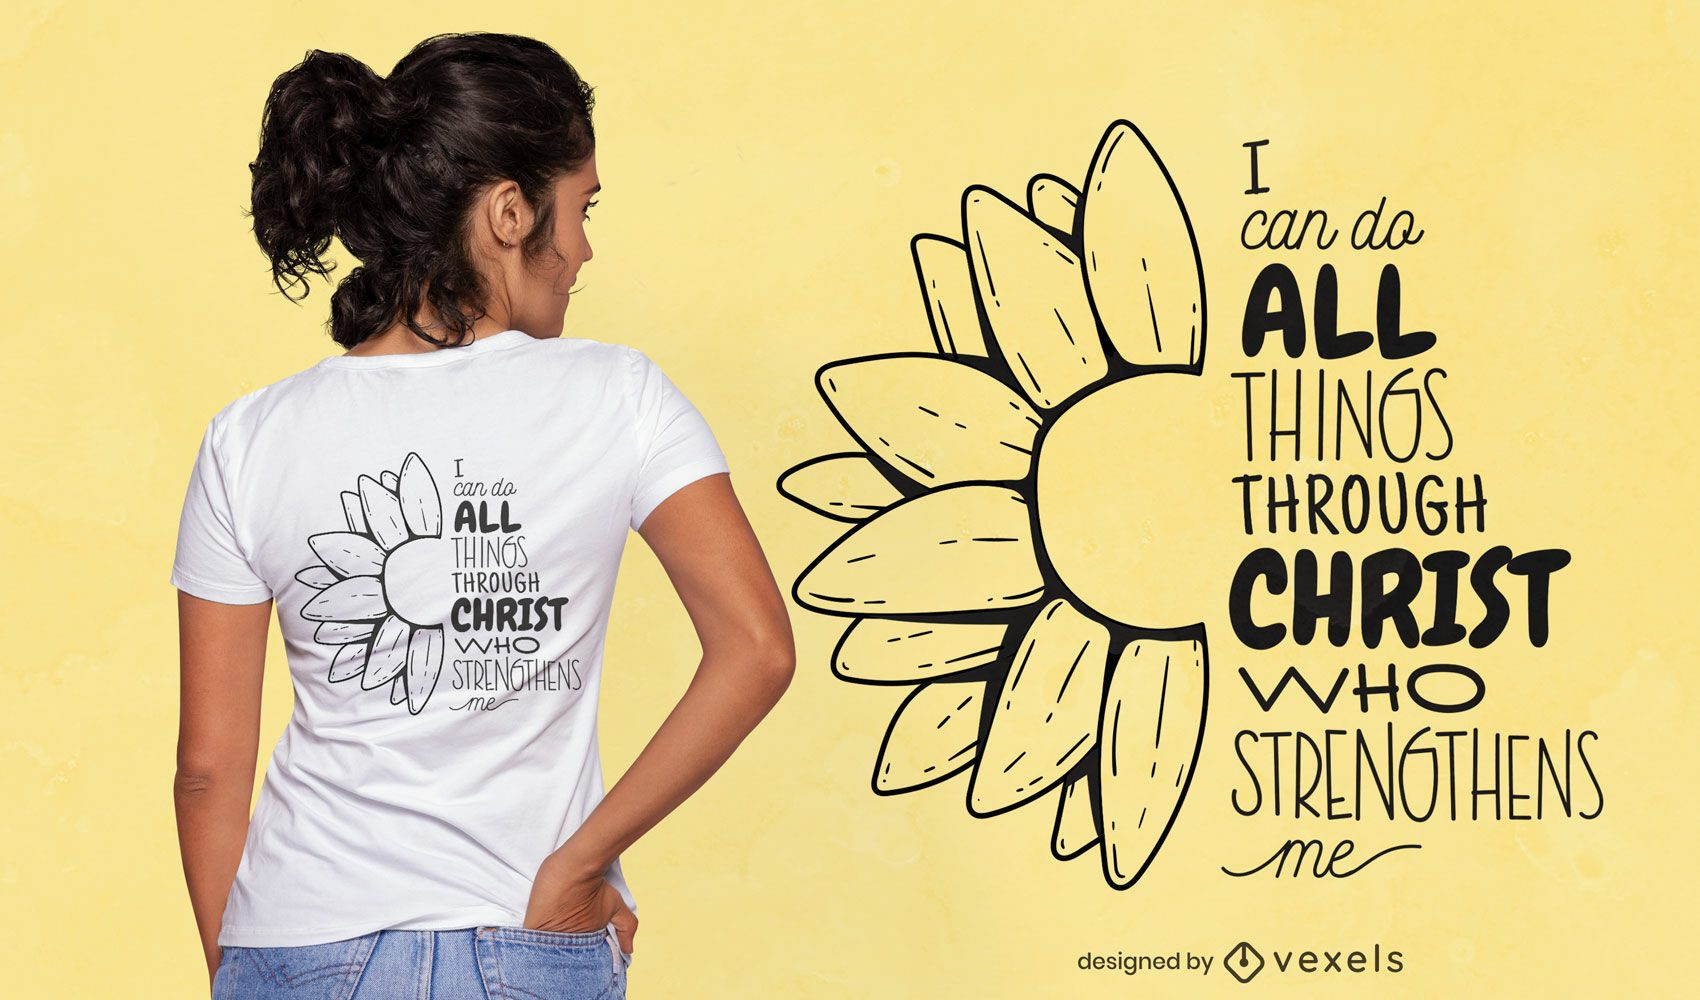 Dise?o de camiseta de cita religiosa cristiana.